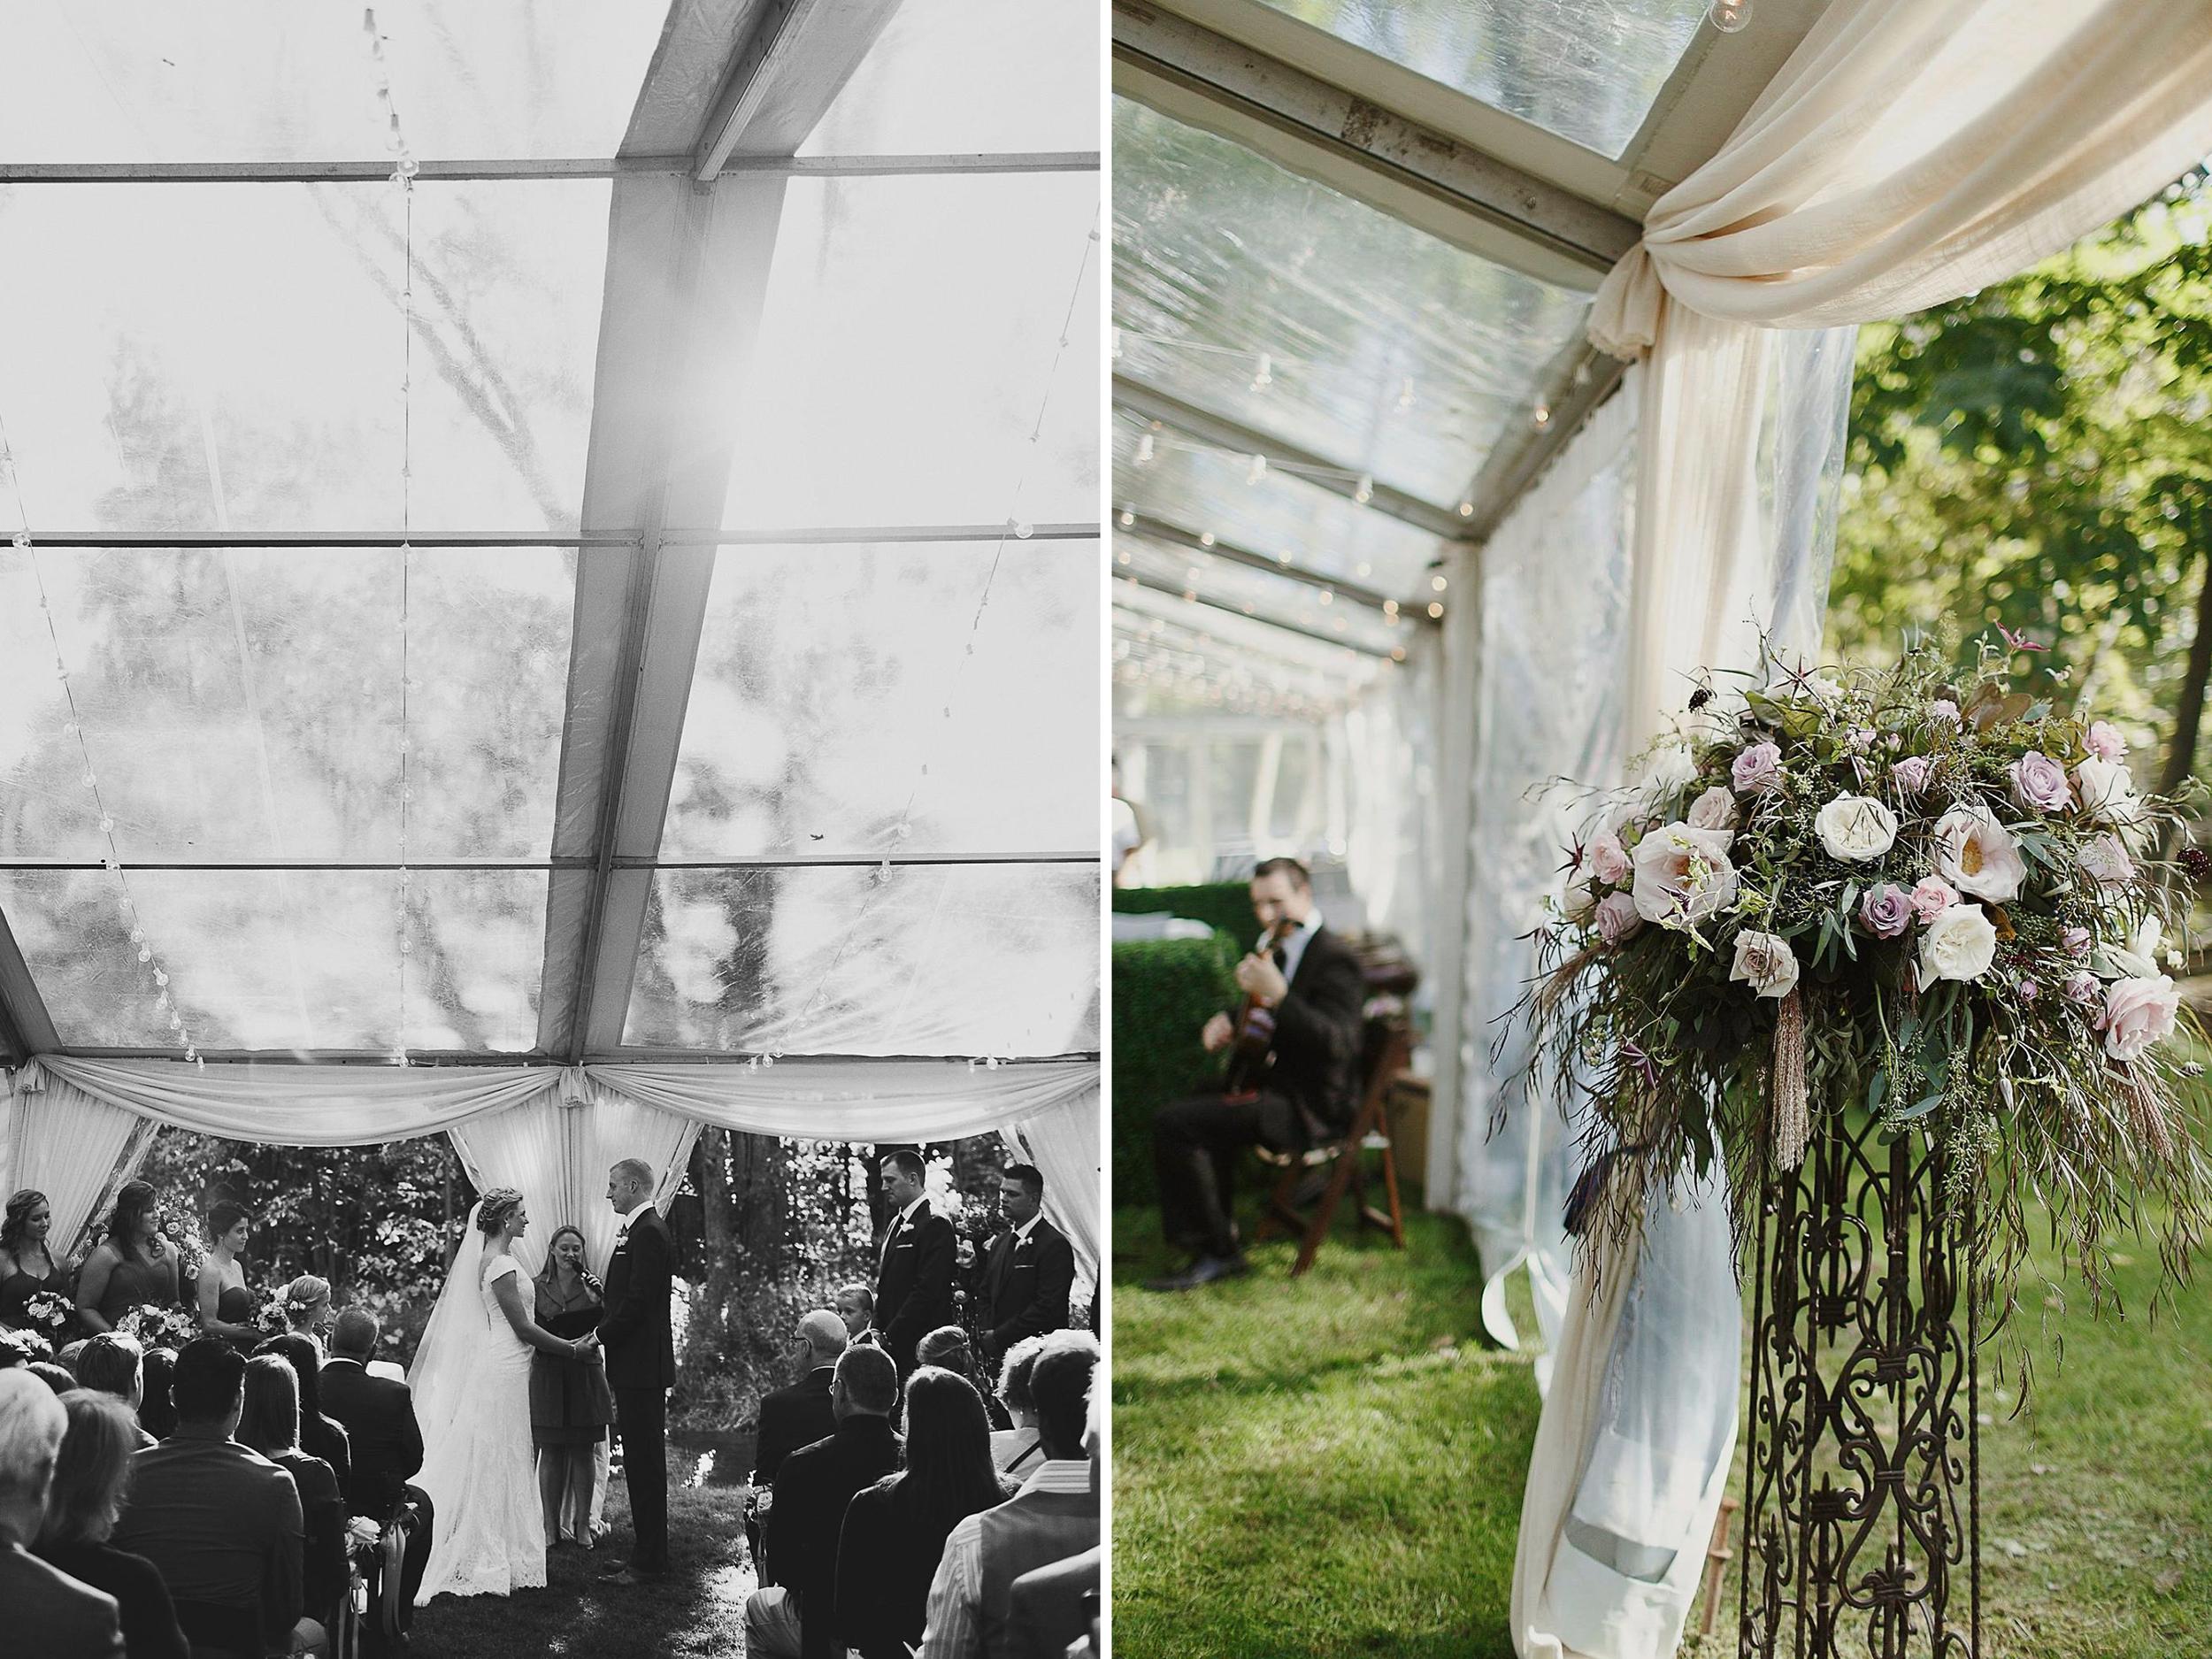 Blythefield Country Club Tented Wedding Near River